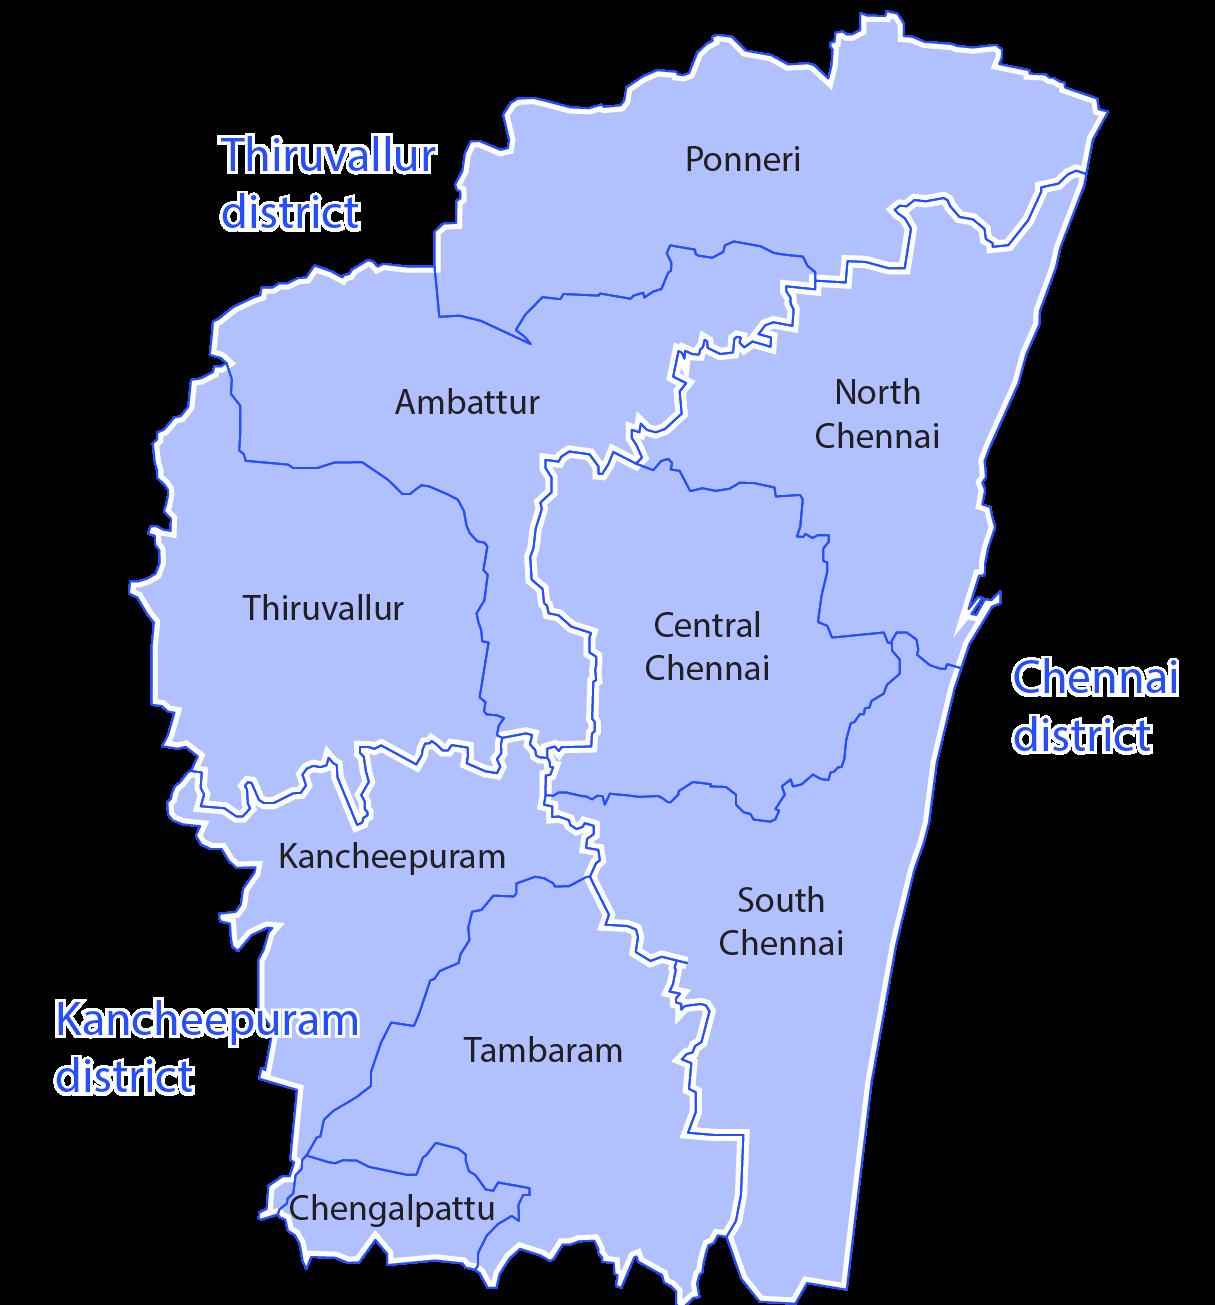 Speculation on Property in Chennai: Location Maduravoyal